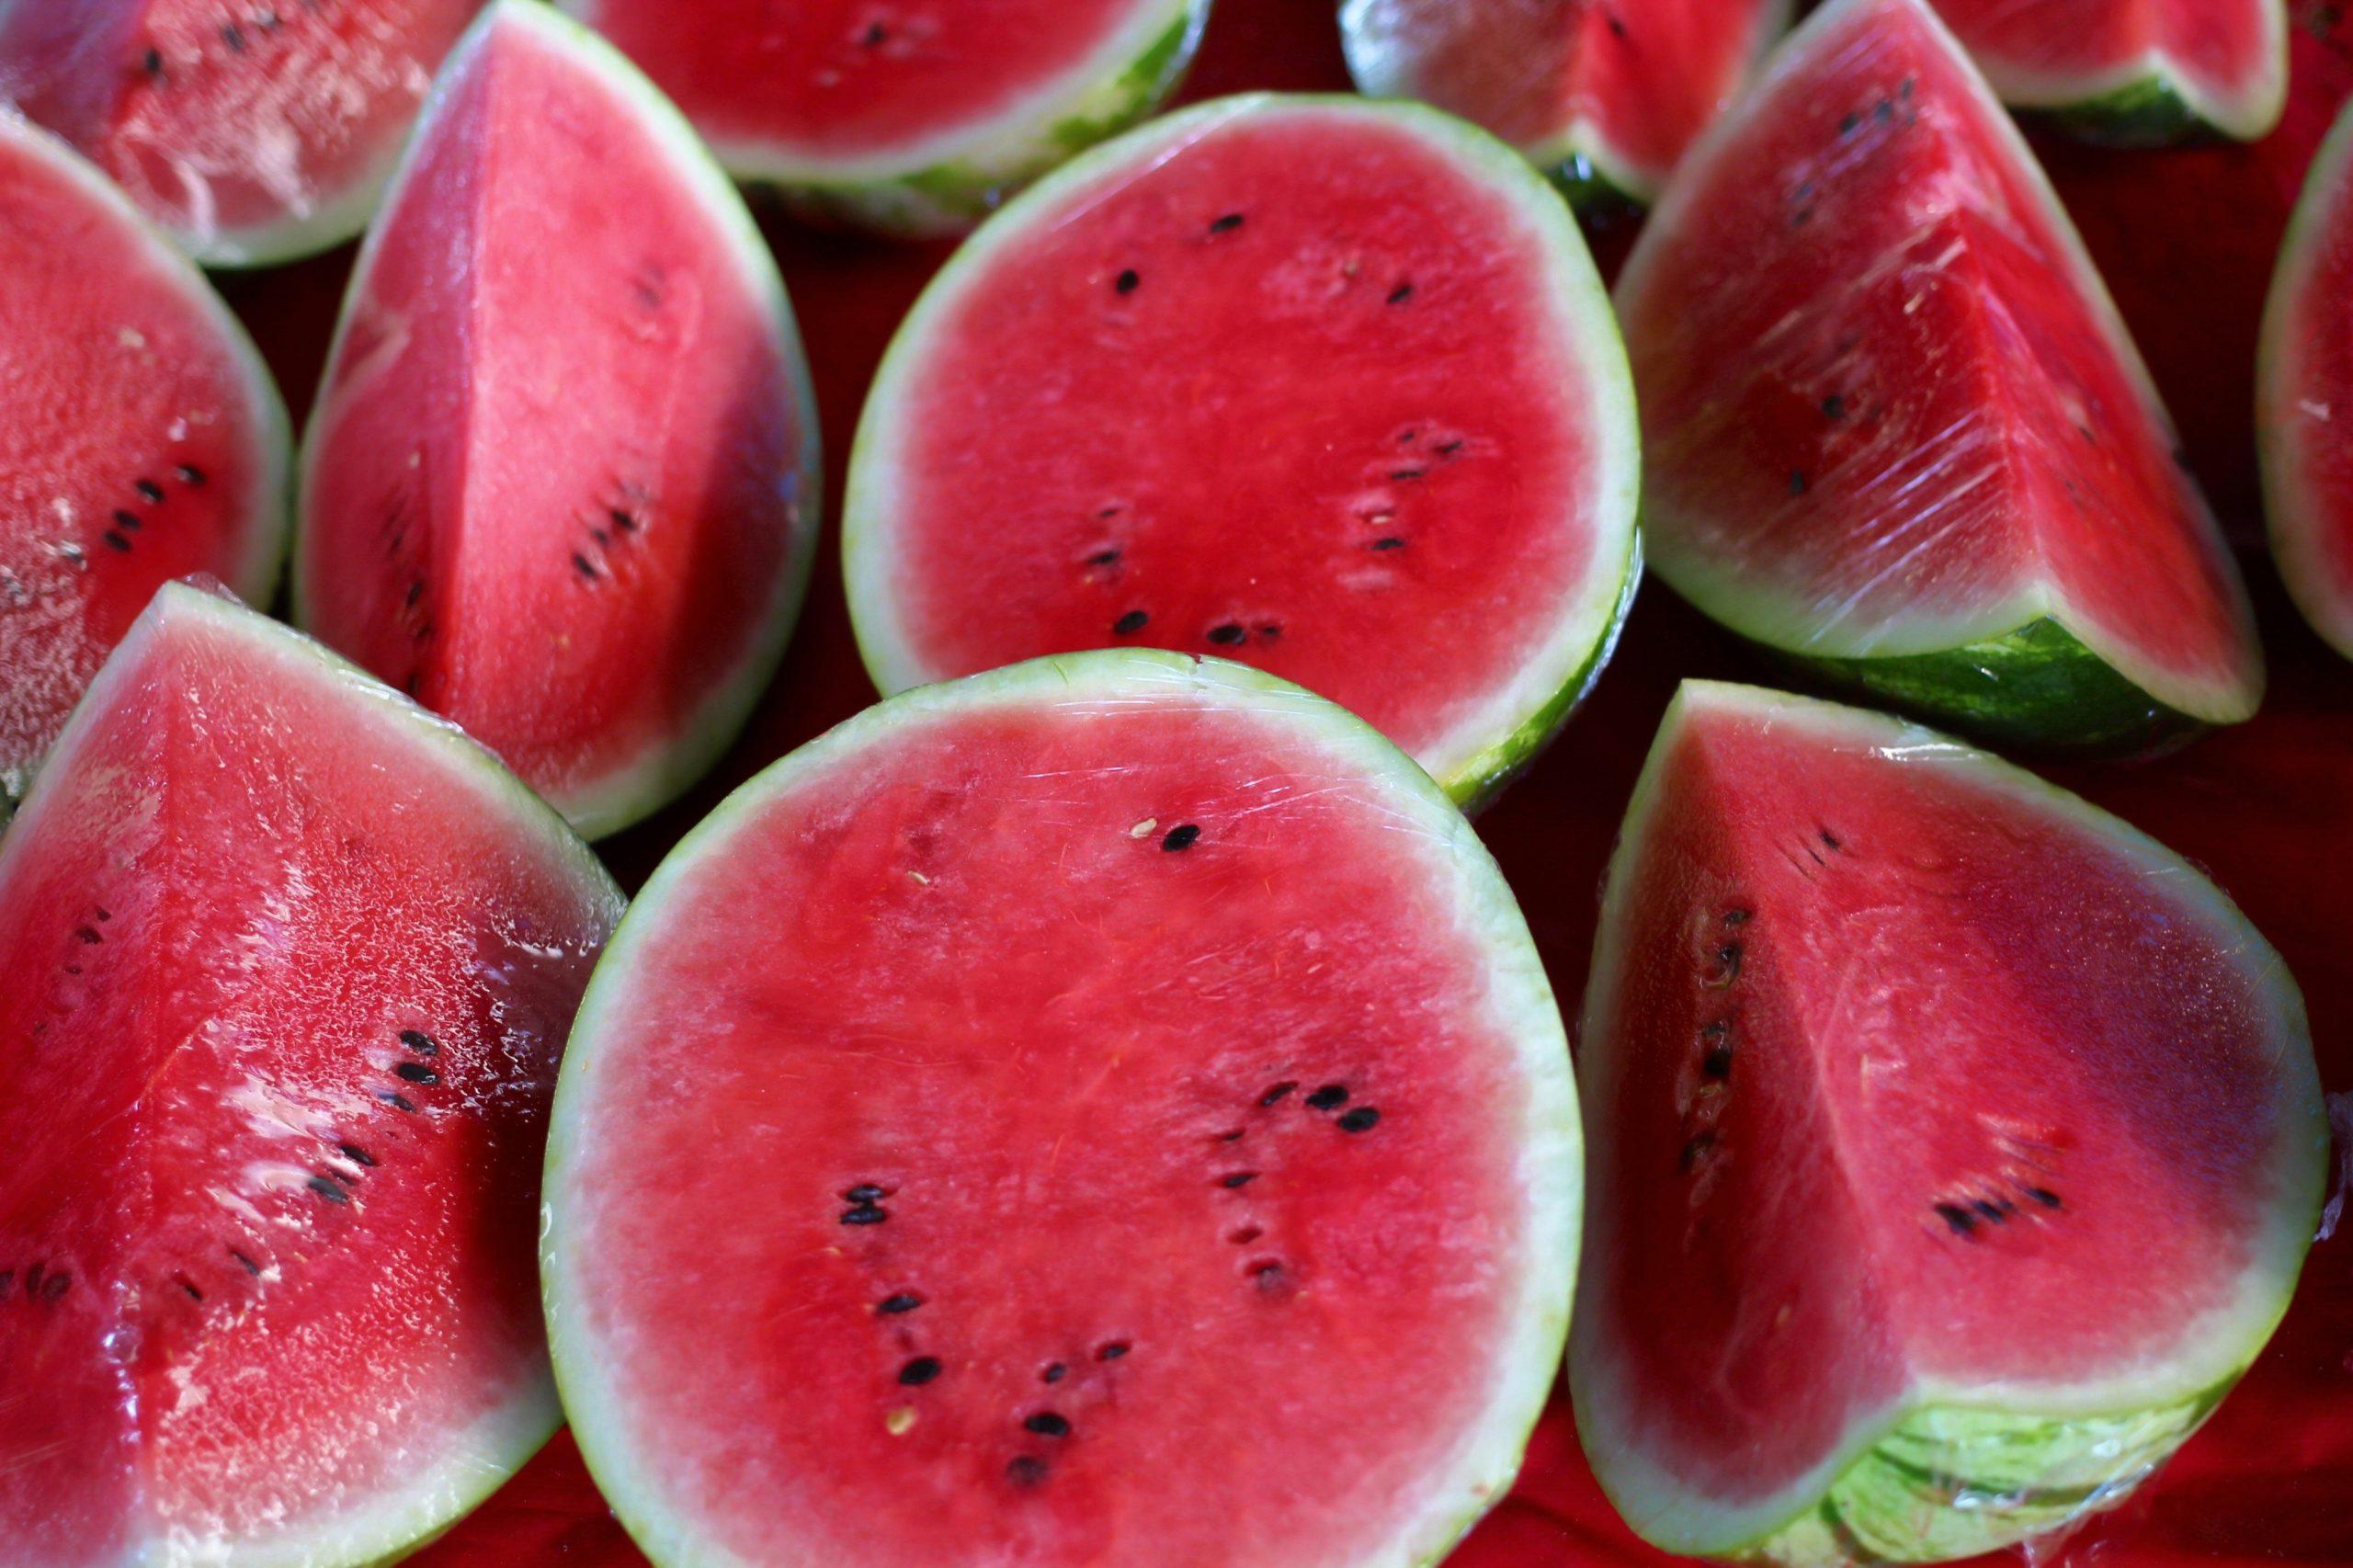 A Juicy, Fun Way To Take Your Vitamins